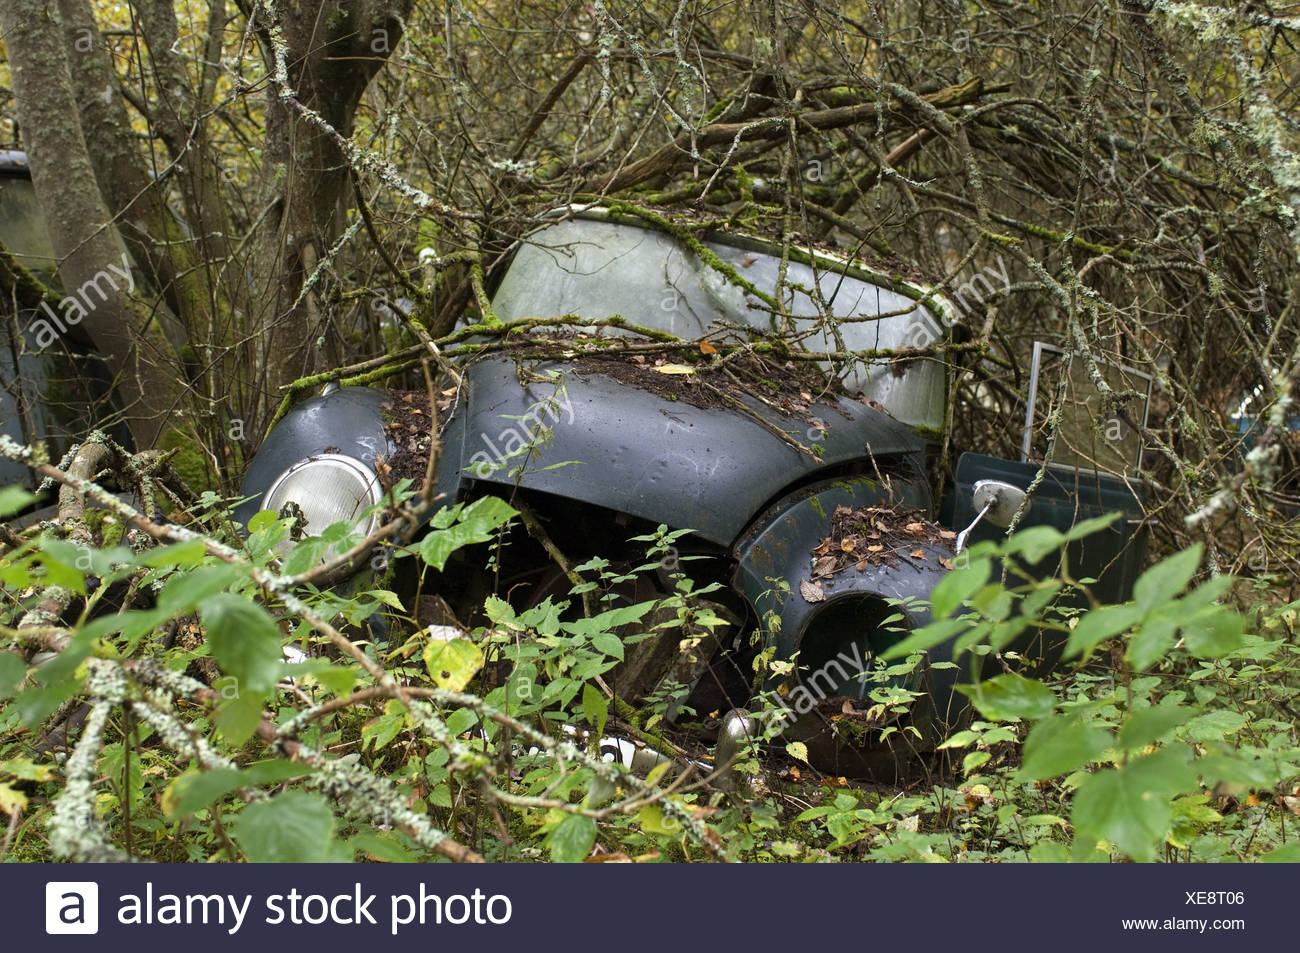 Scrap car (old Dampf-Kraft-Wagen) in forest, Sweden - Stock Image